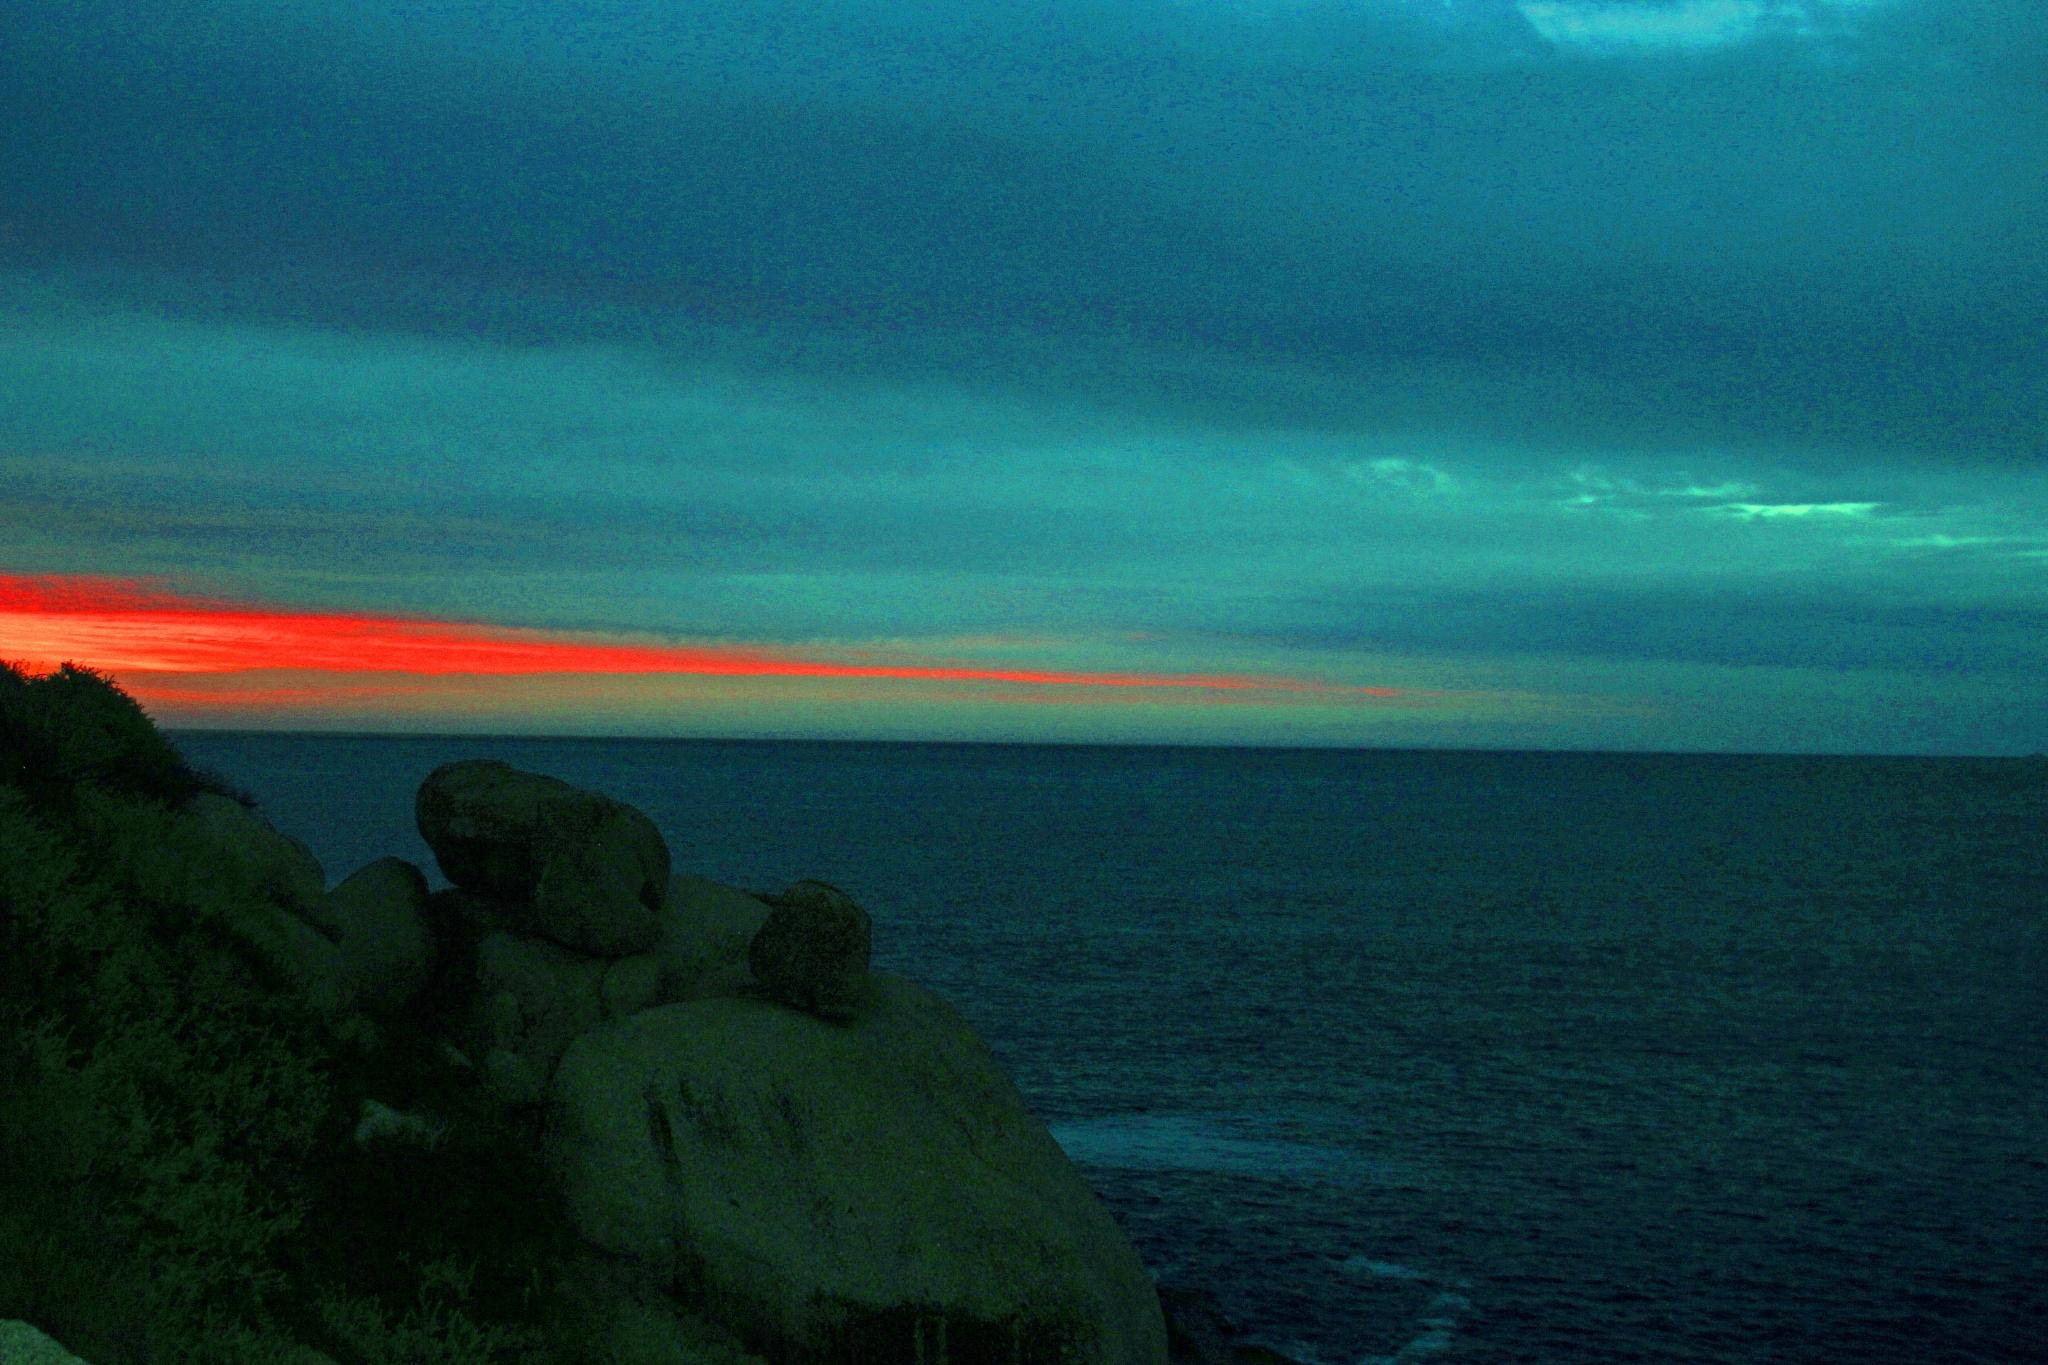 Flame by Nauta Piscatorque